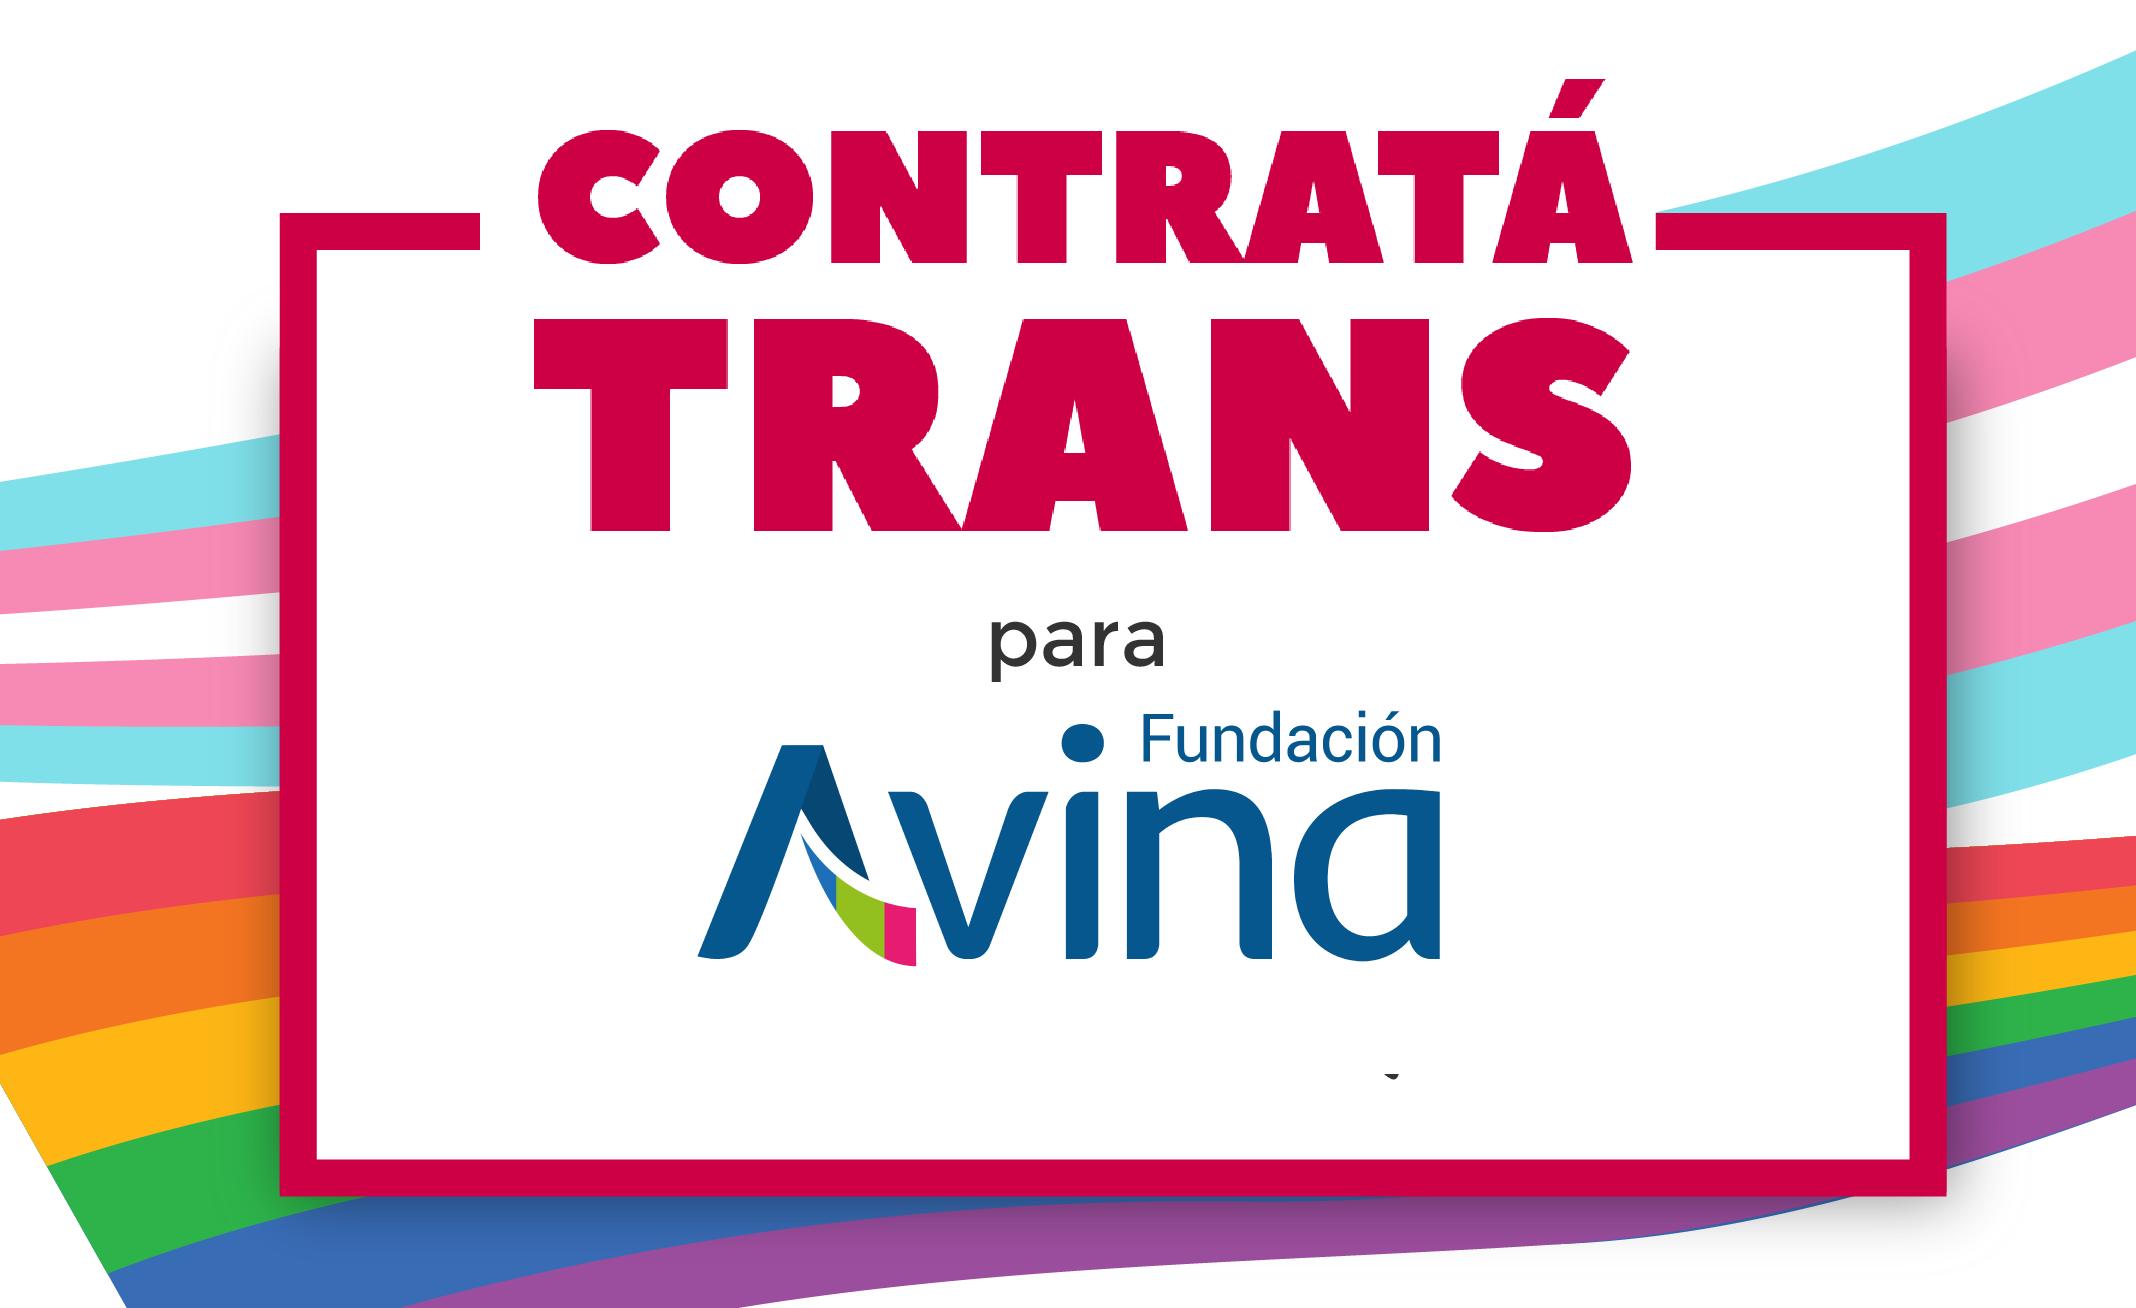 Contrata Trans & AVINA